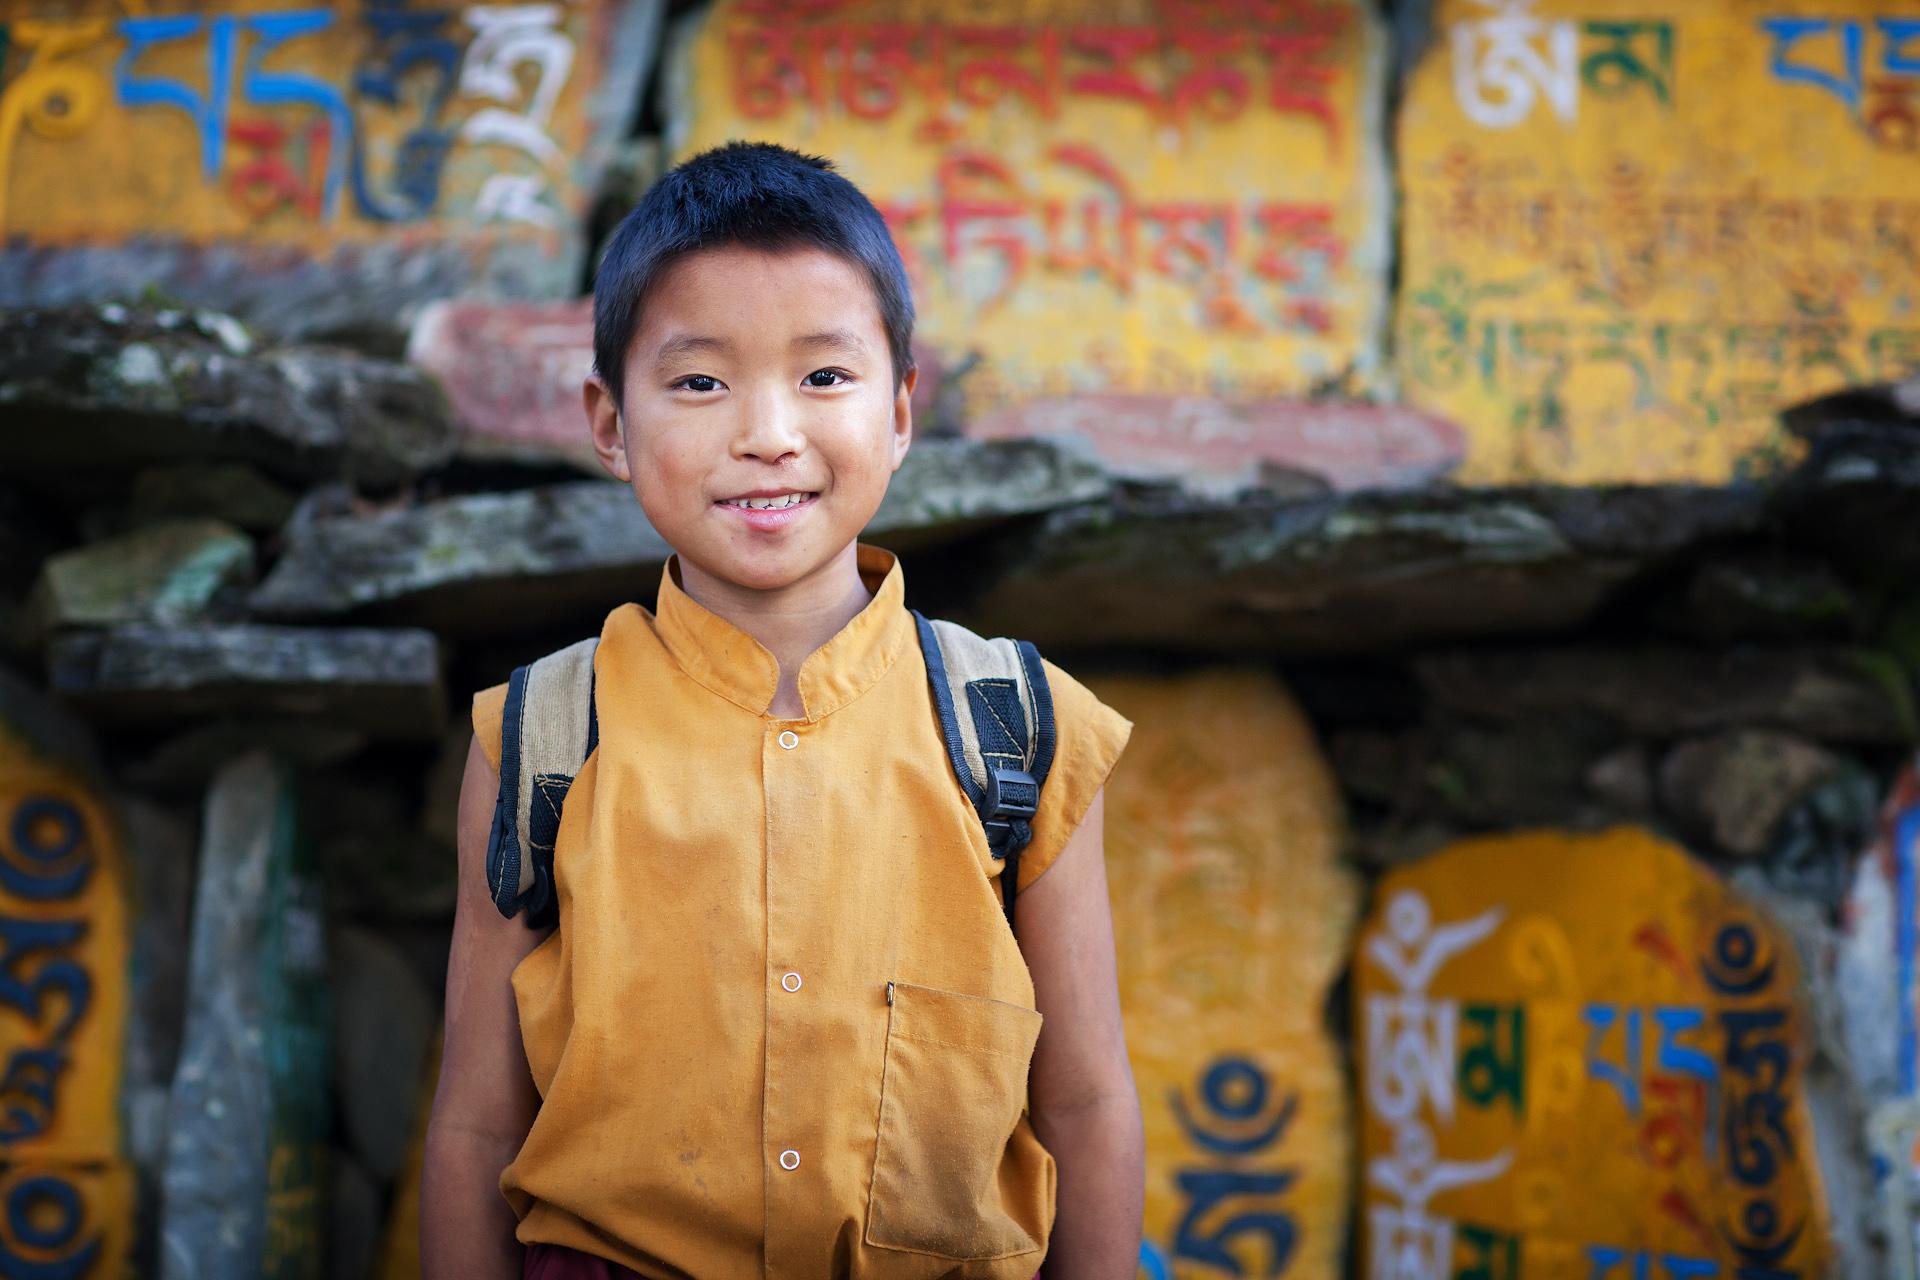 India-Sikkim-Travel-Tashiding-Monastery-Monk-Portrait-3.JPG